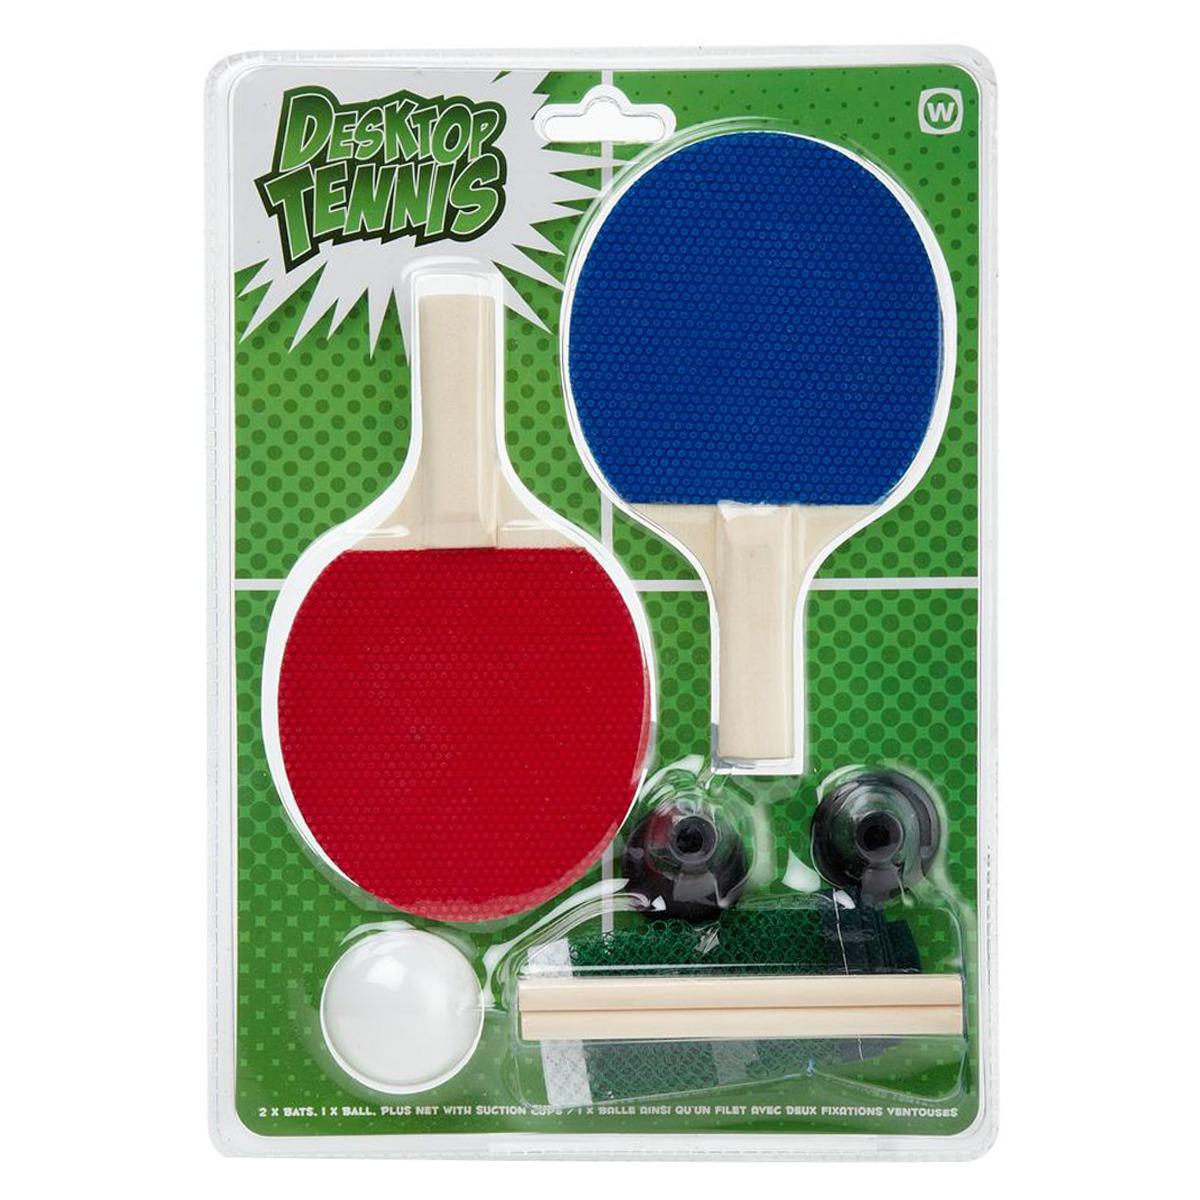 Set de Ping Pong, palas pelota y red